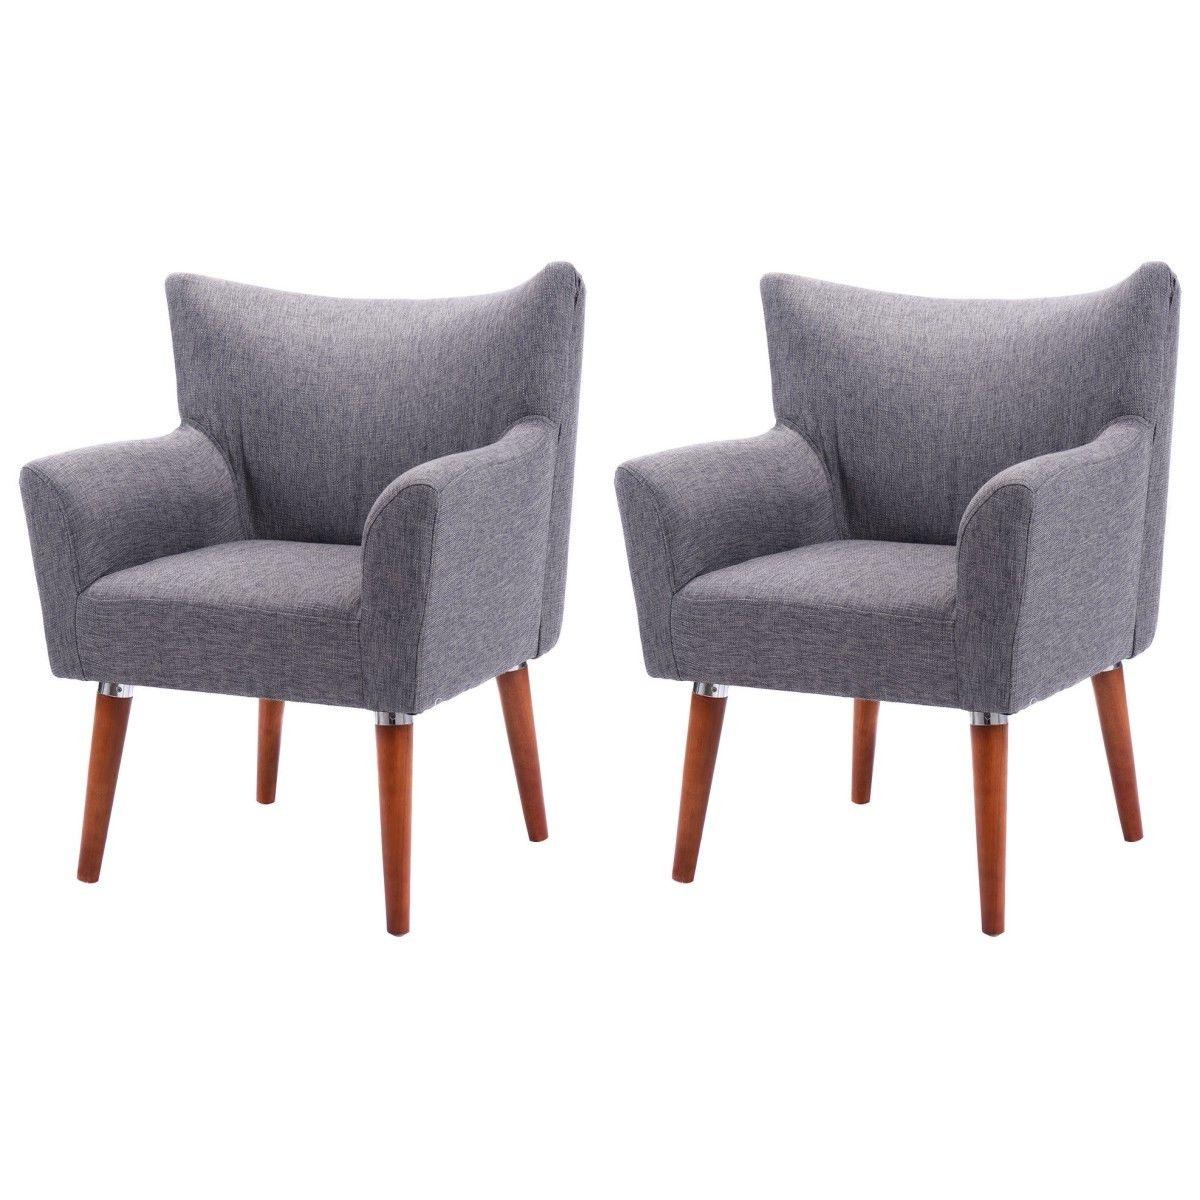 Giantex Set Of 2 Leisure Arm Chair Single Sofa Couch Seat Modern Home Chairs Garden Living Room Furniture Sofa 2*HW51502COFFEE